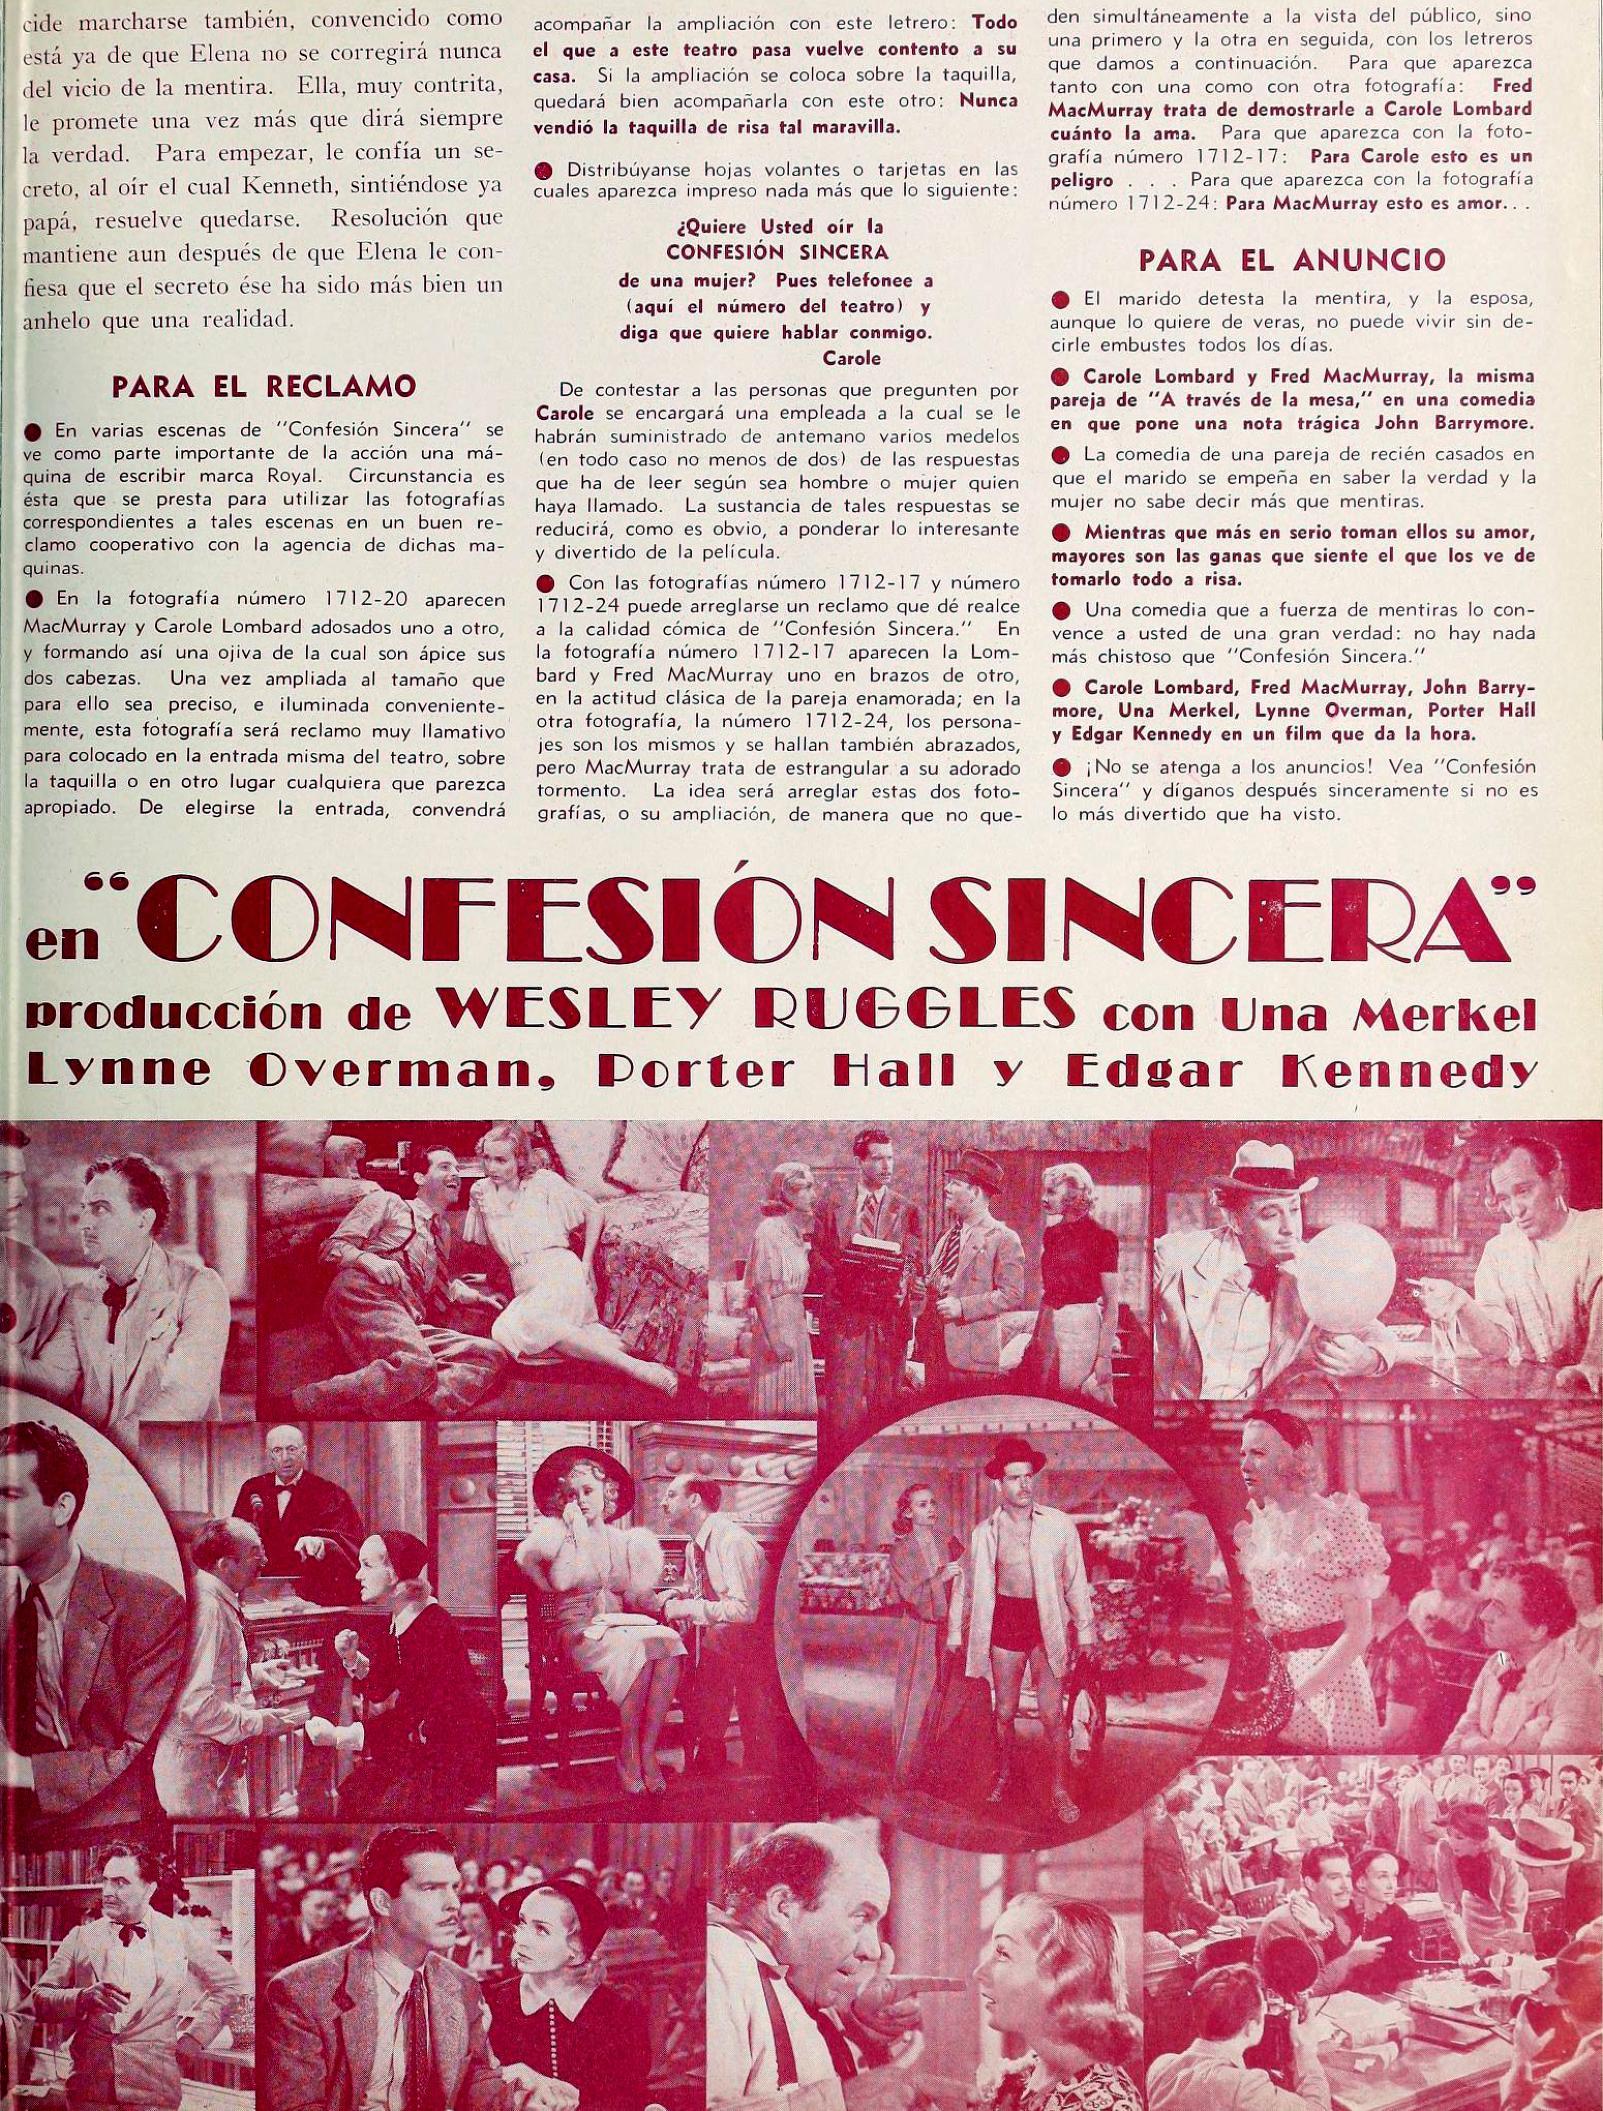 carole lombard true confession mensajero paramount jan 1938ba